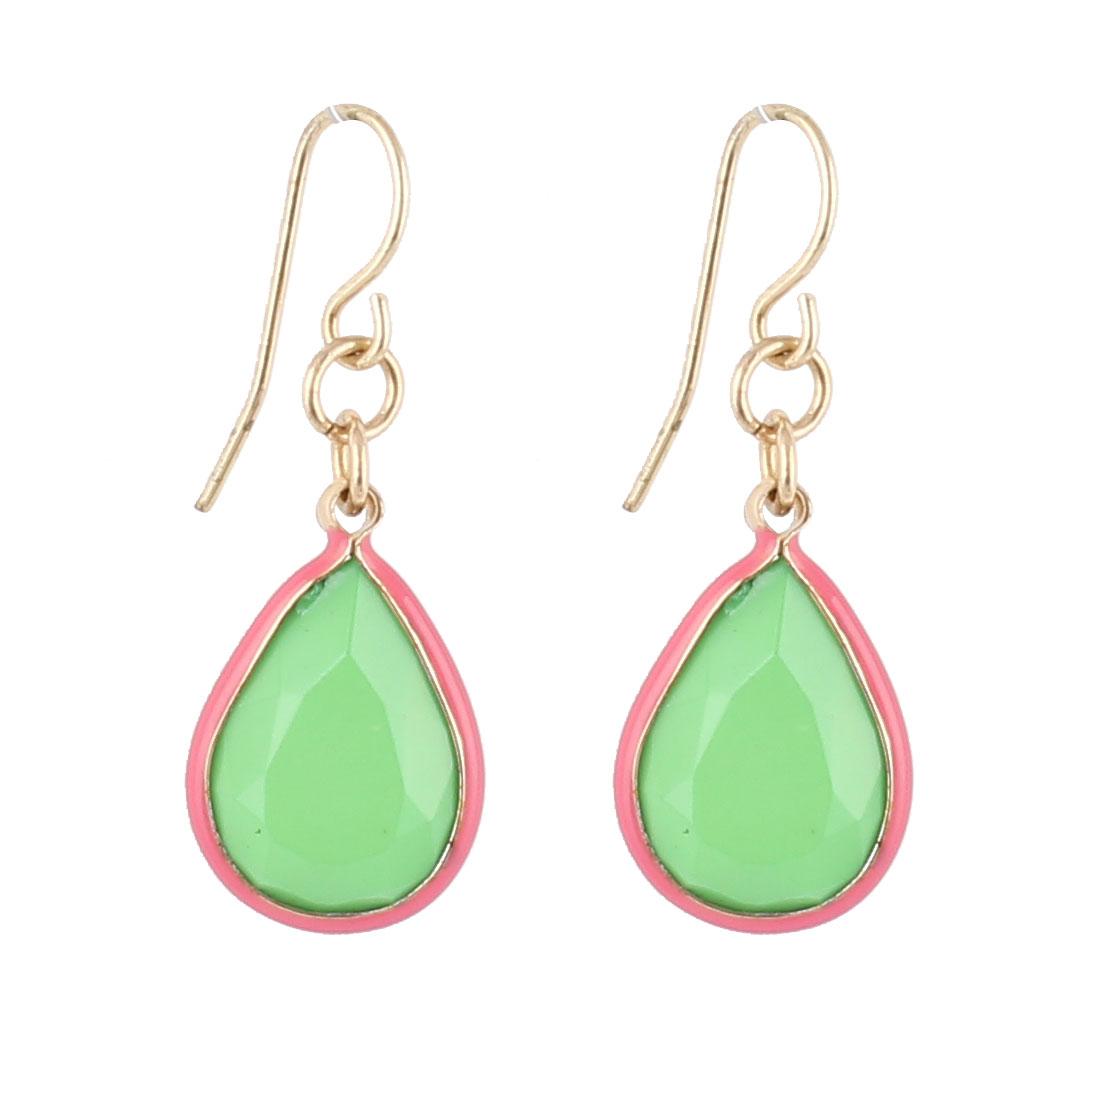 "Women Green Red Faux Crystal Inlaid Waterdrop Shape Dangling Pendant Metal Fish Hook Earrings Earbob Tricolor 1.2"" Length Pair"